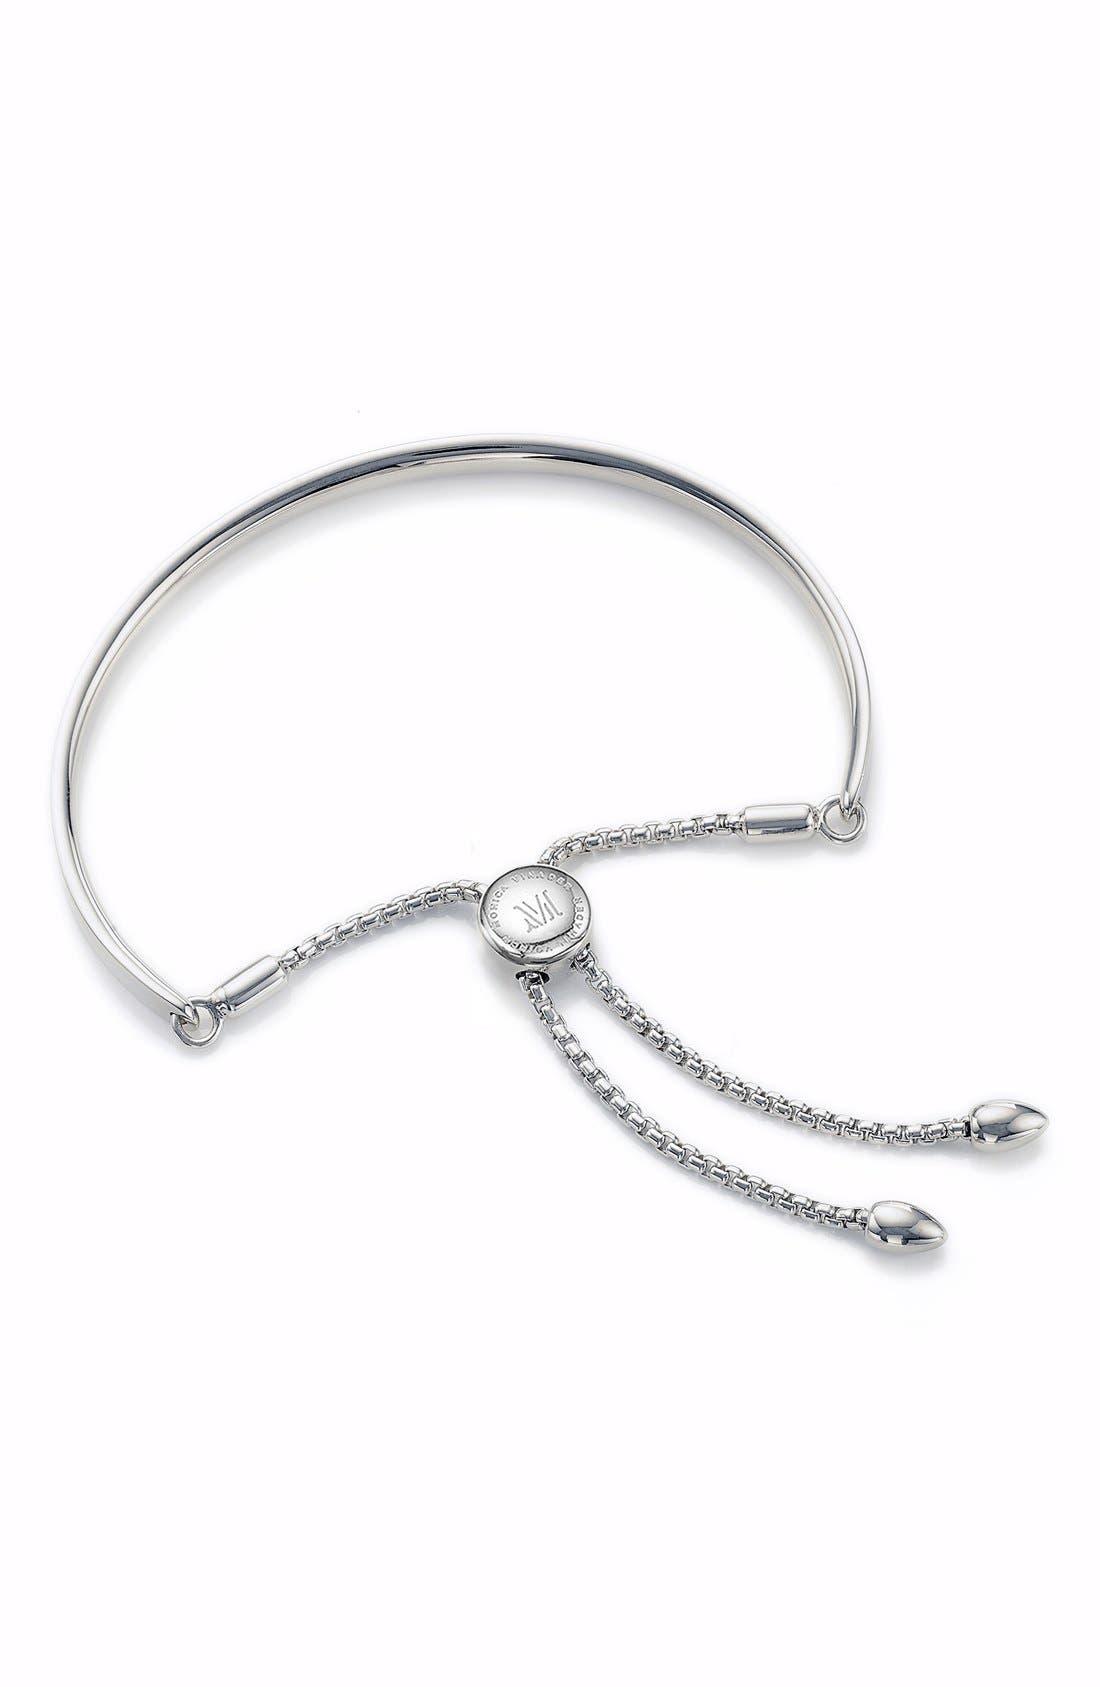 Fiji Petite Friendship Bracelet,                         Main,                         color, Silver